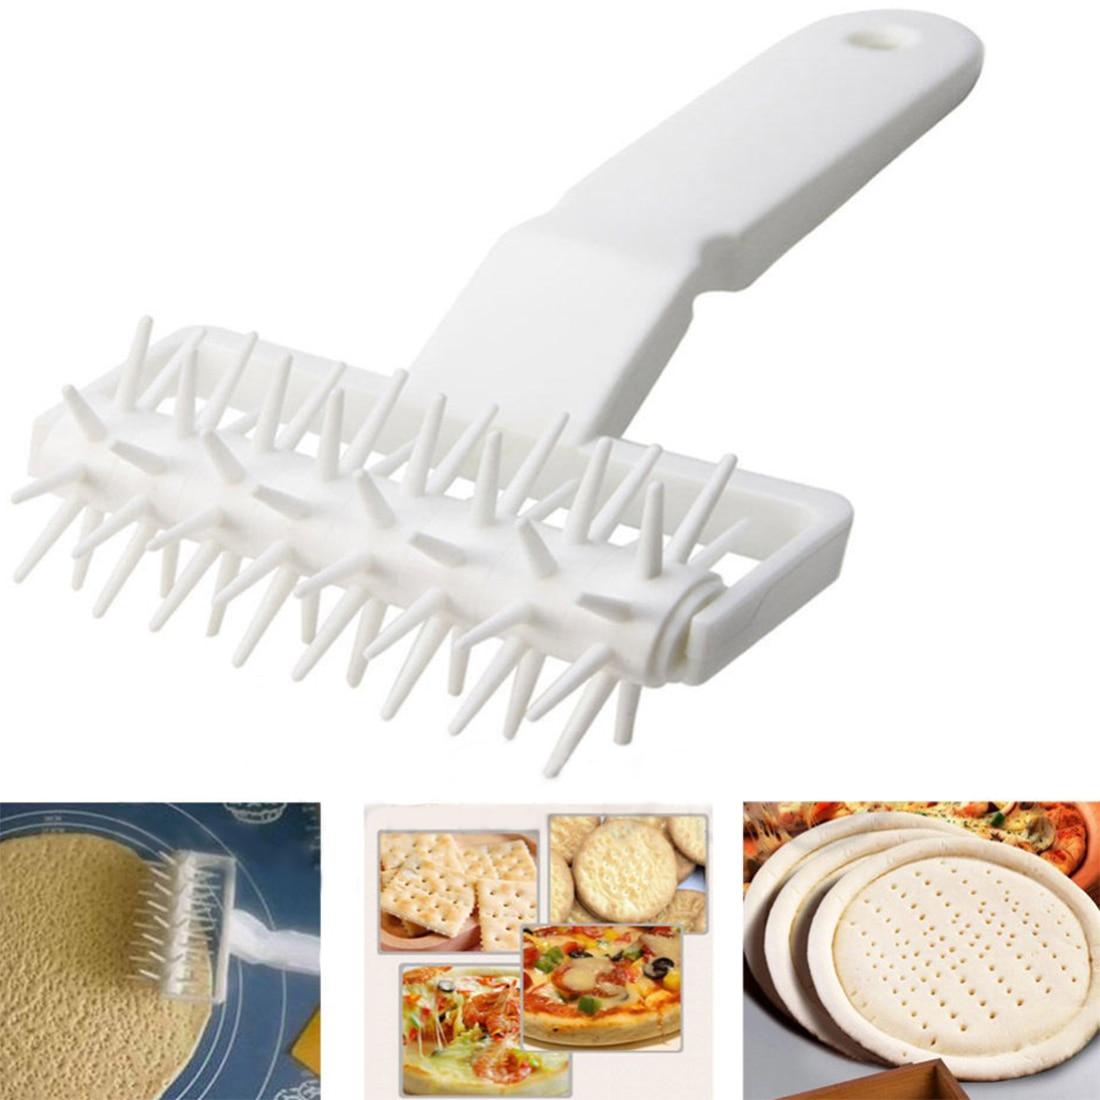 Grande Barato Prático Biscoitos de Pizza Pie Pastry Dough Roller Massa Pitter Crosta Embossing Ferramenta Cozinhar Ferramentas rodillo Masa